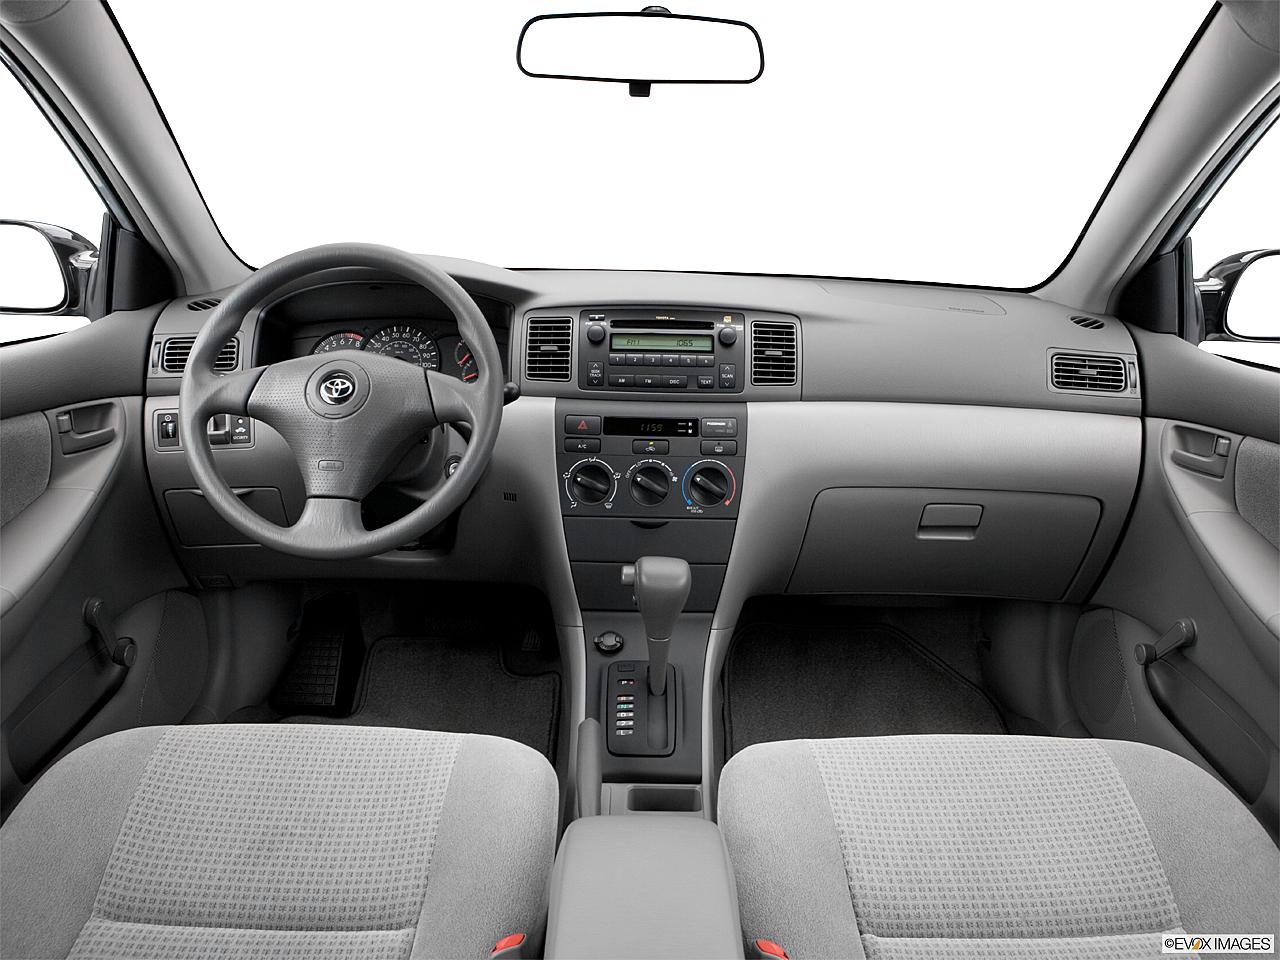 2006 Toyota Corolla Ce Centered Wide Dash Shot